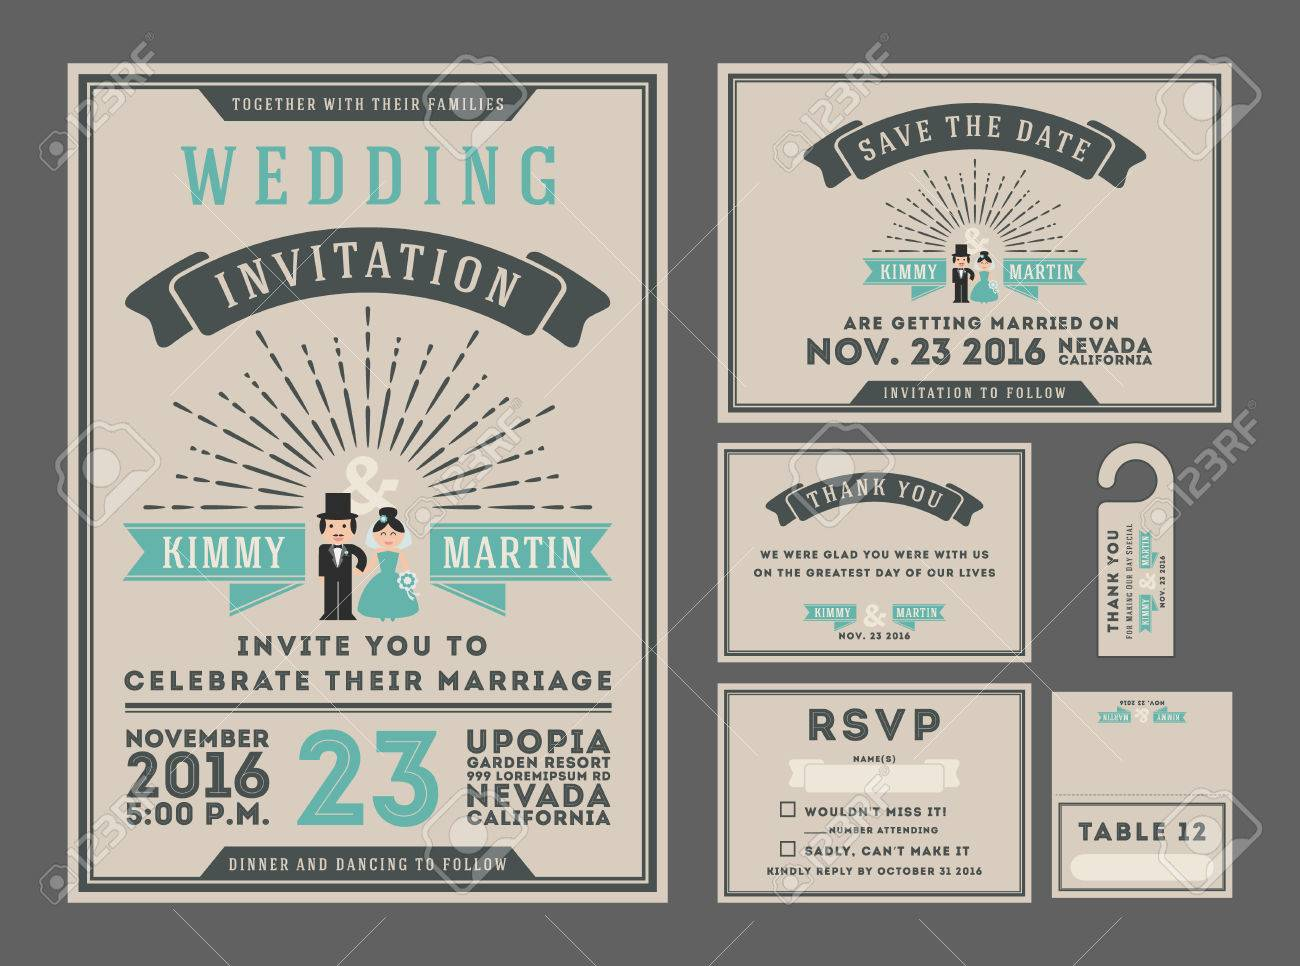 Classic Vintage Sunburst Wedding Invitation Design With Couple